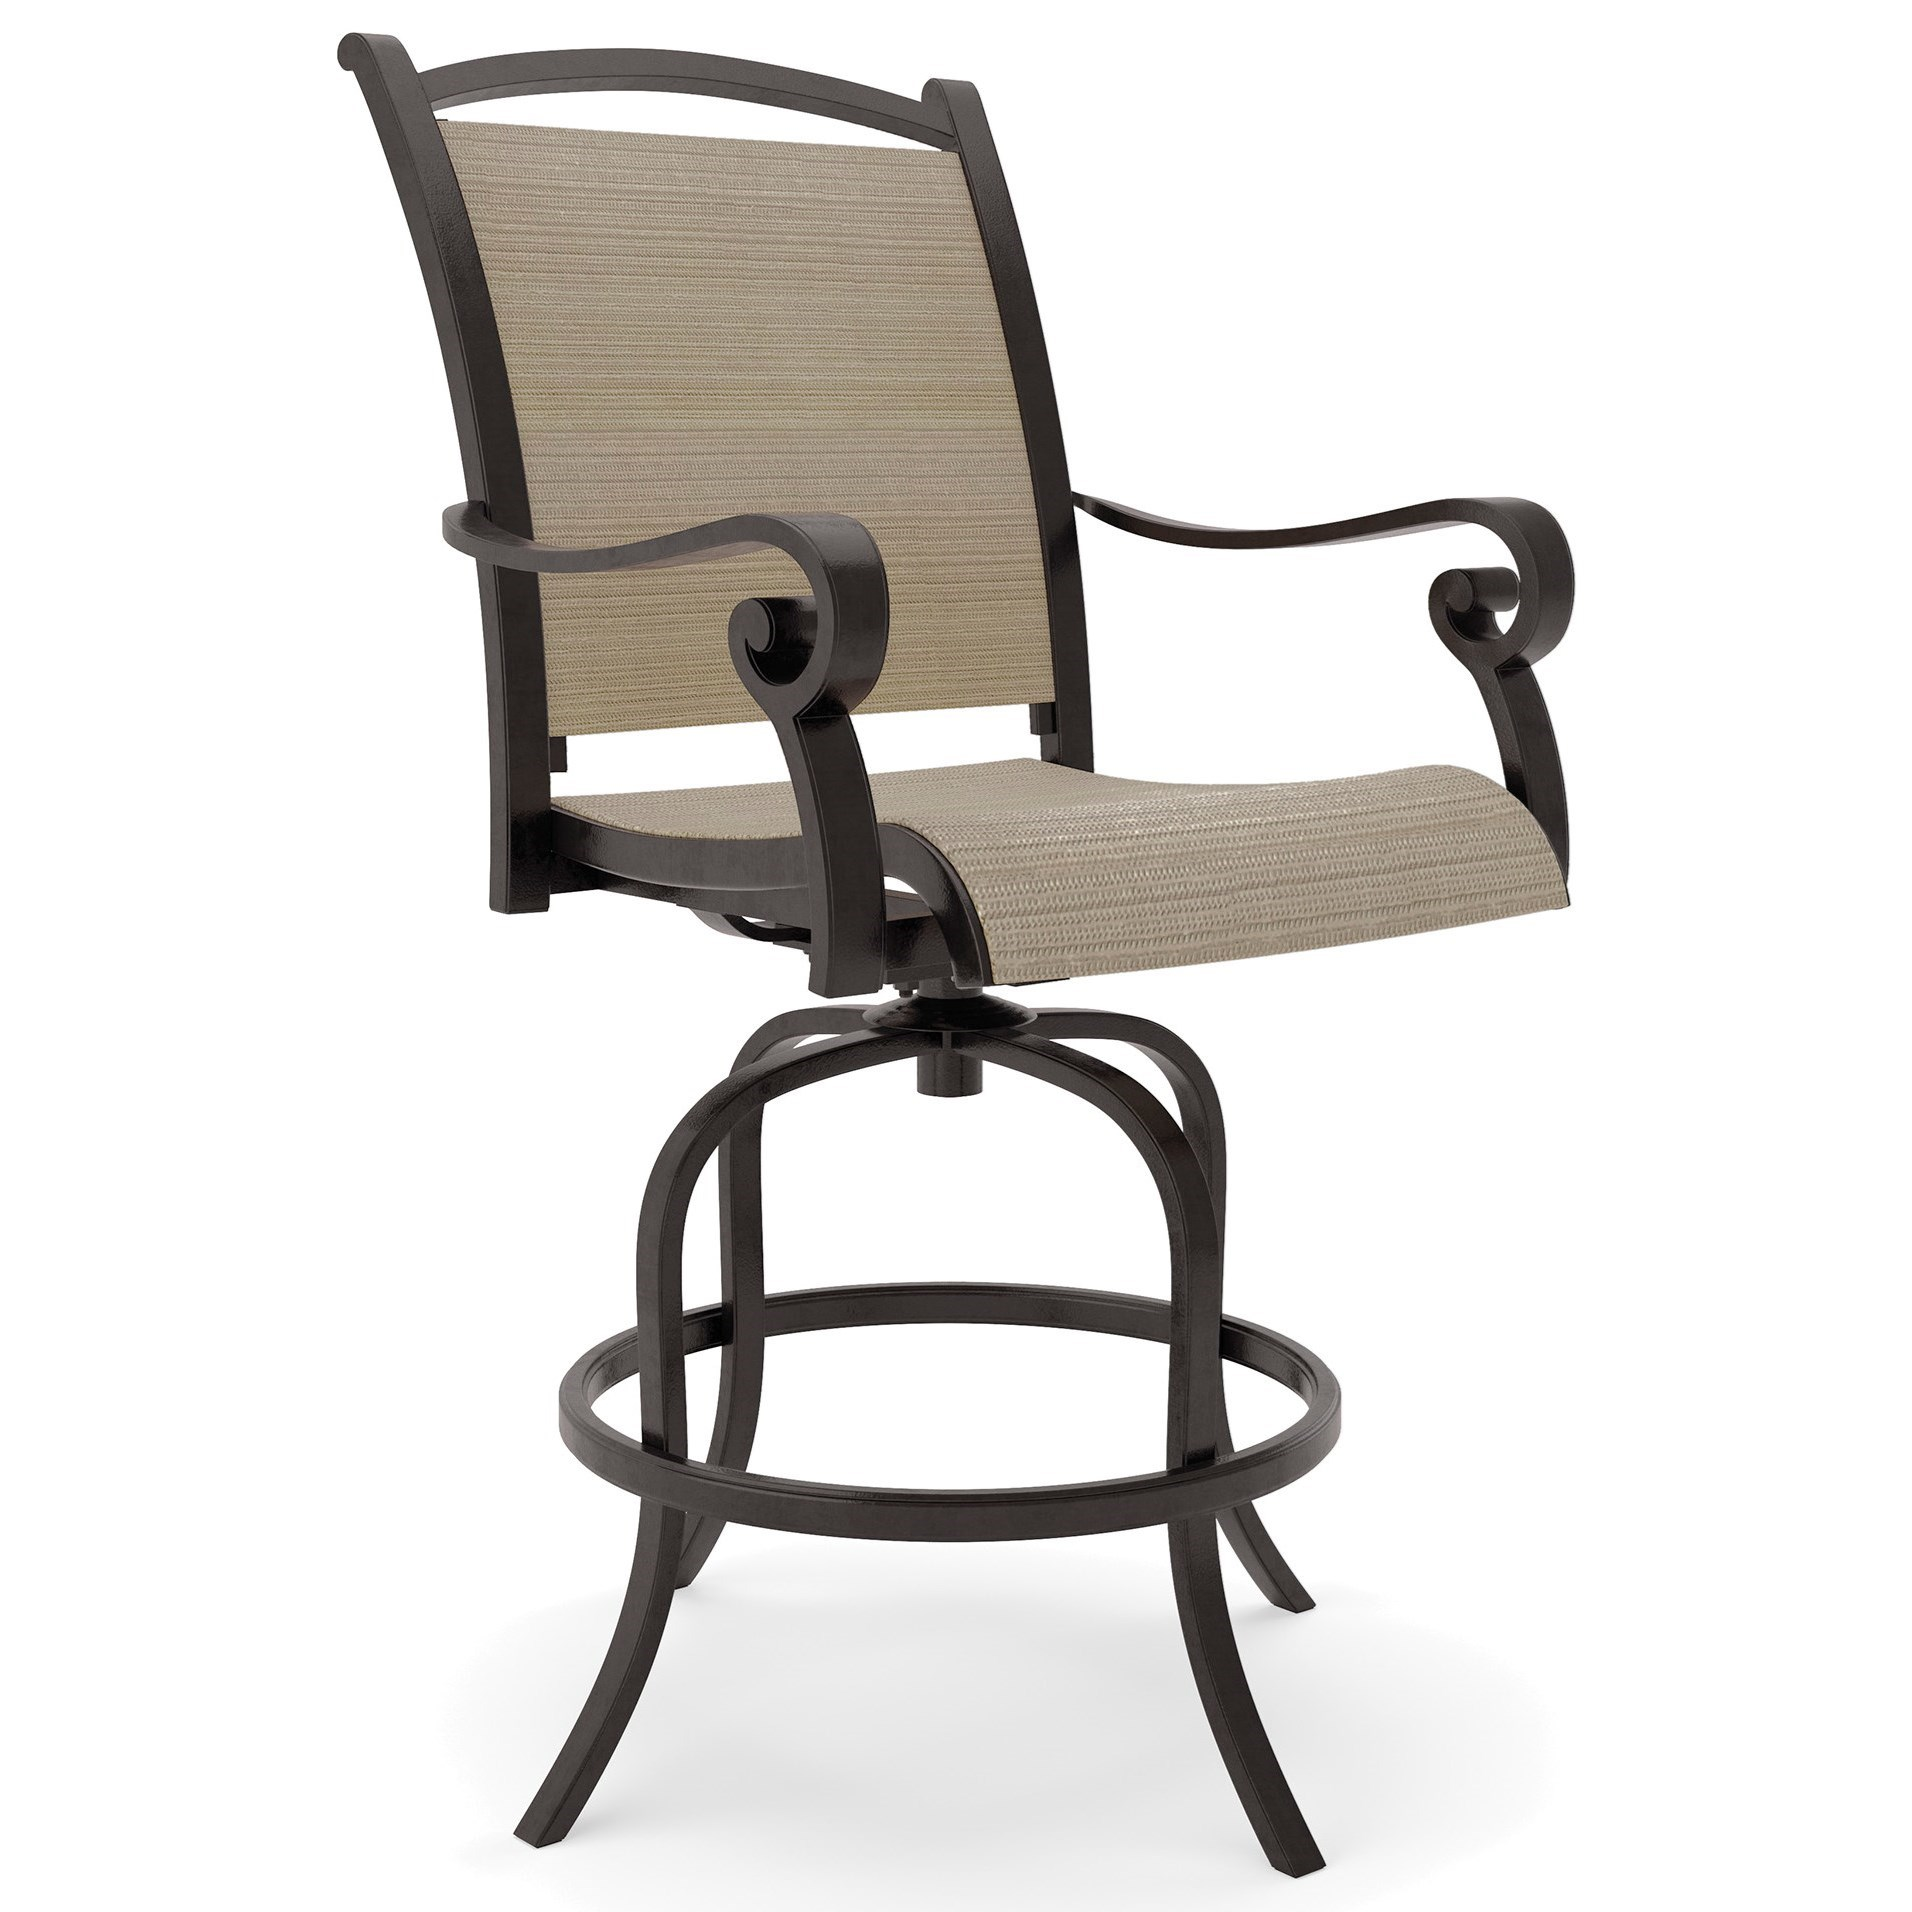 swivel chair nebraska furniture mart xkcd office ashley signature design bass lake p317 130 set of 2